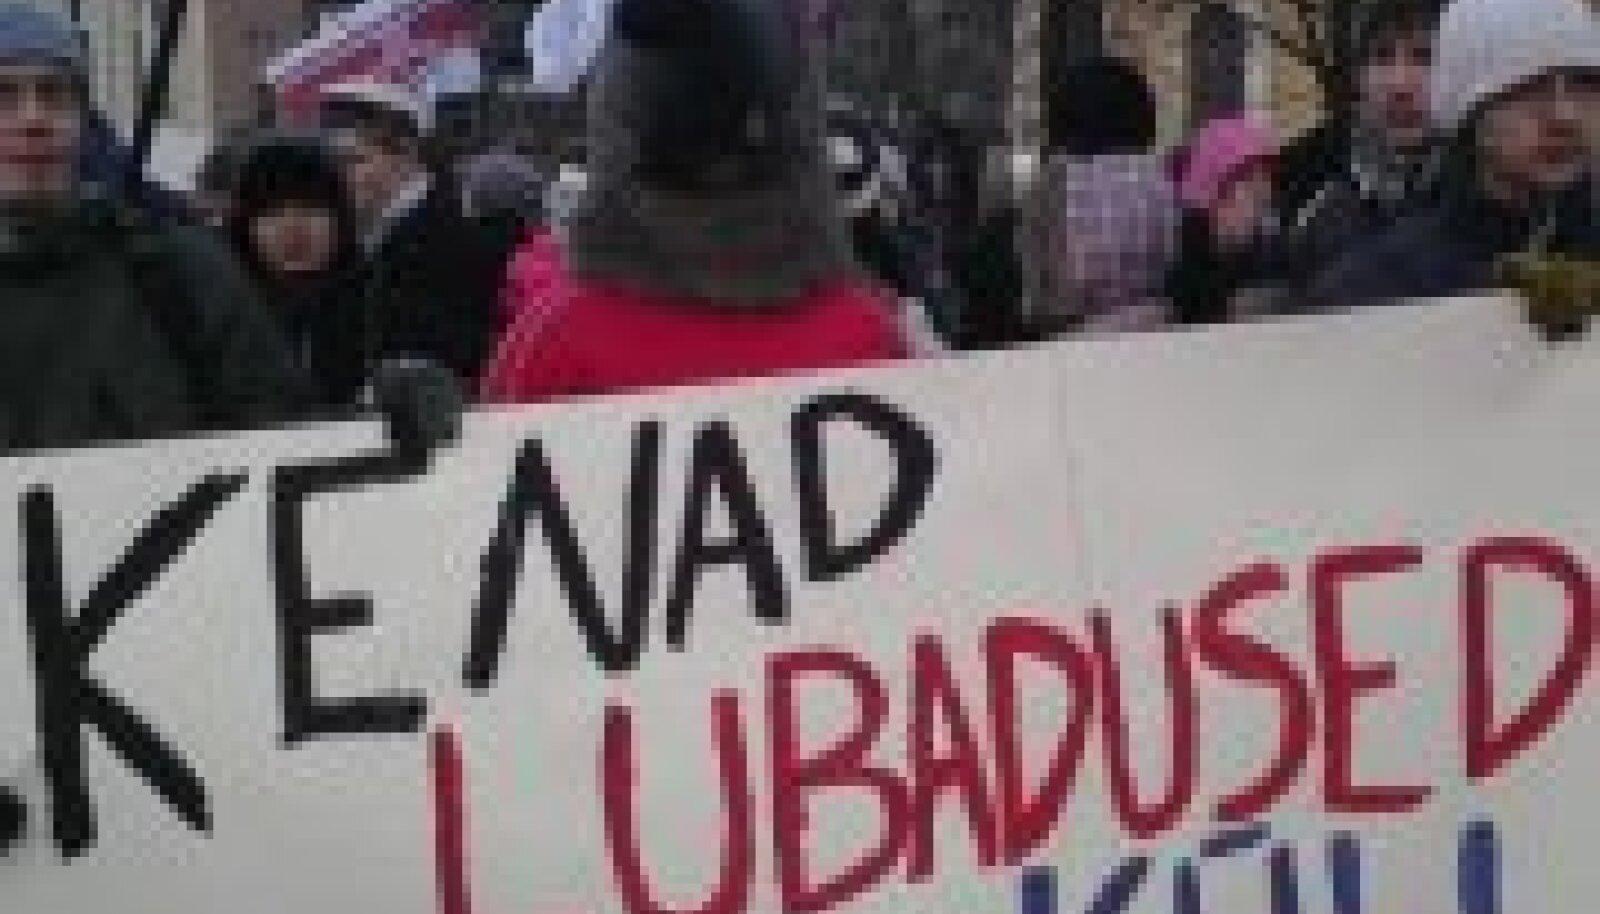 Tudengid protestivad